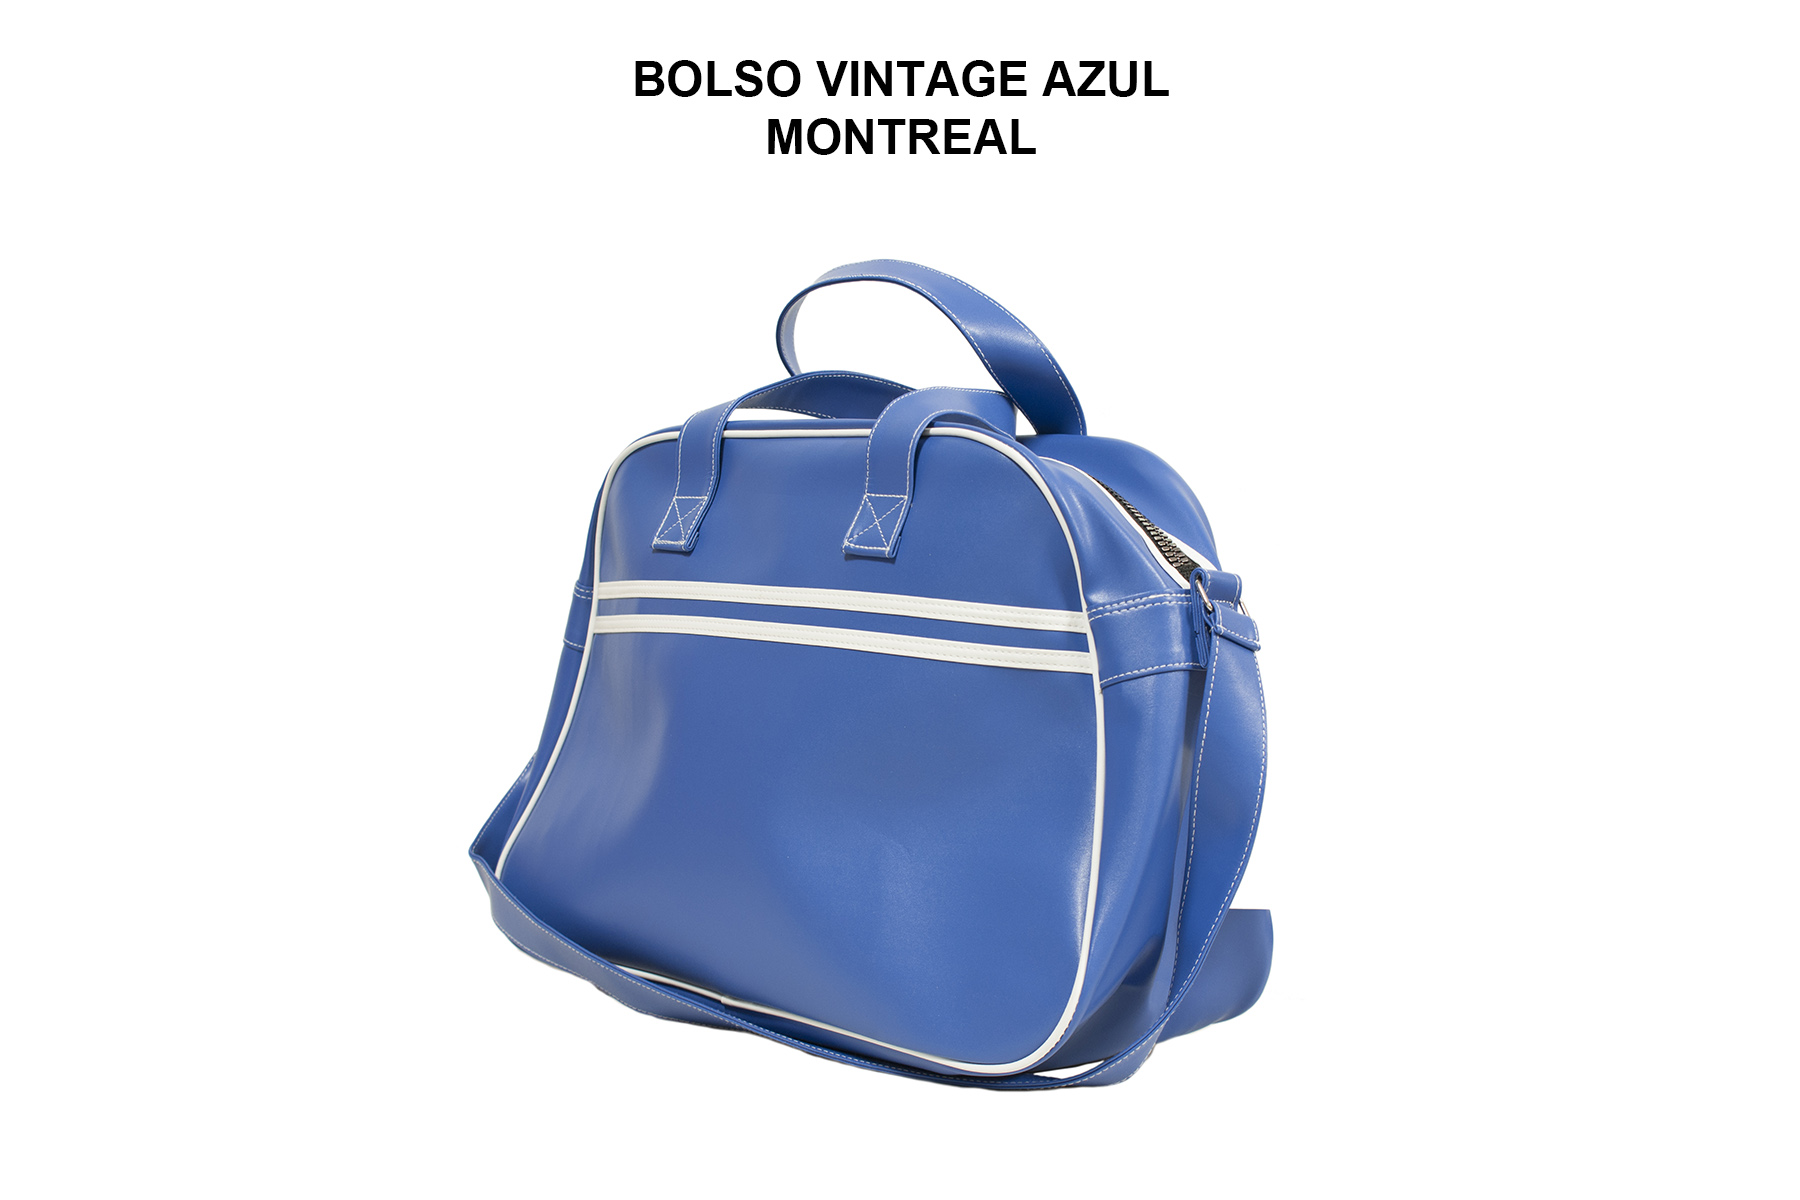 BOLSO VINTAGE AZUL MONTREAL